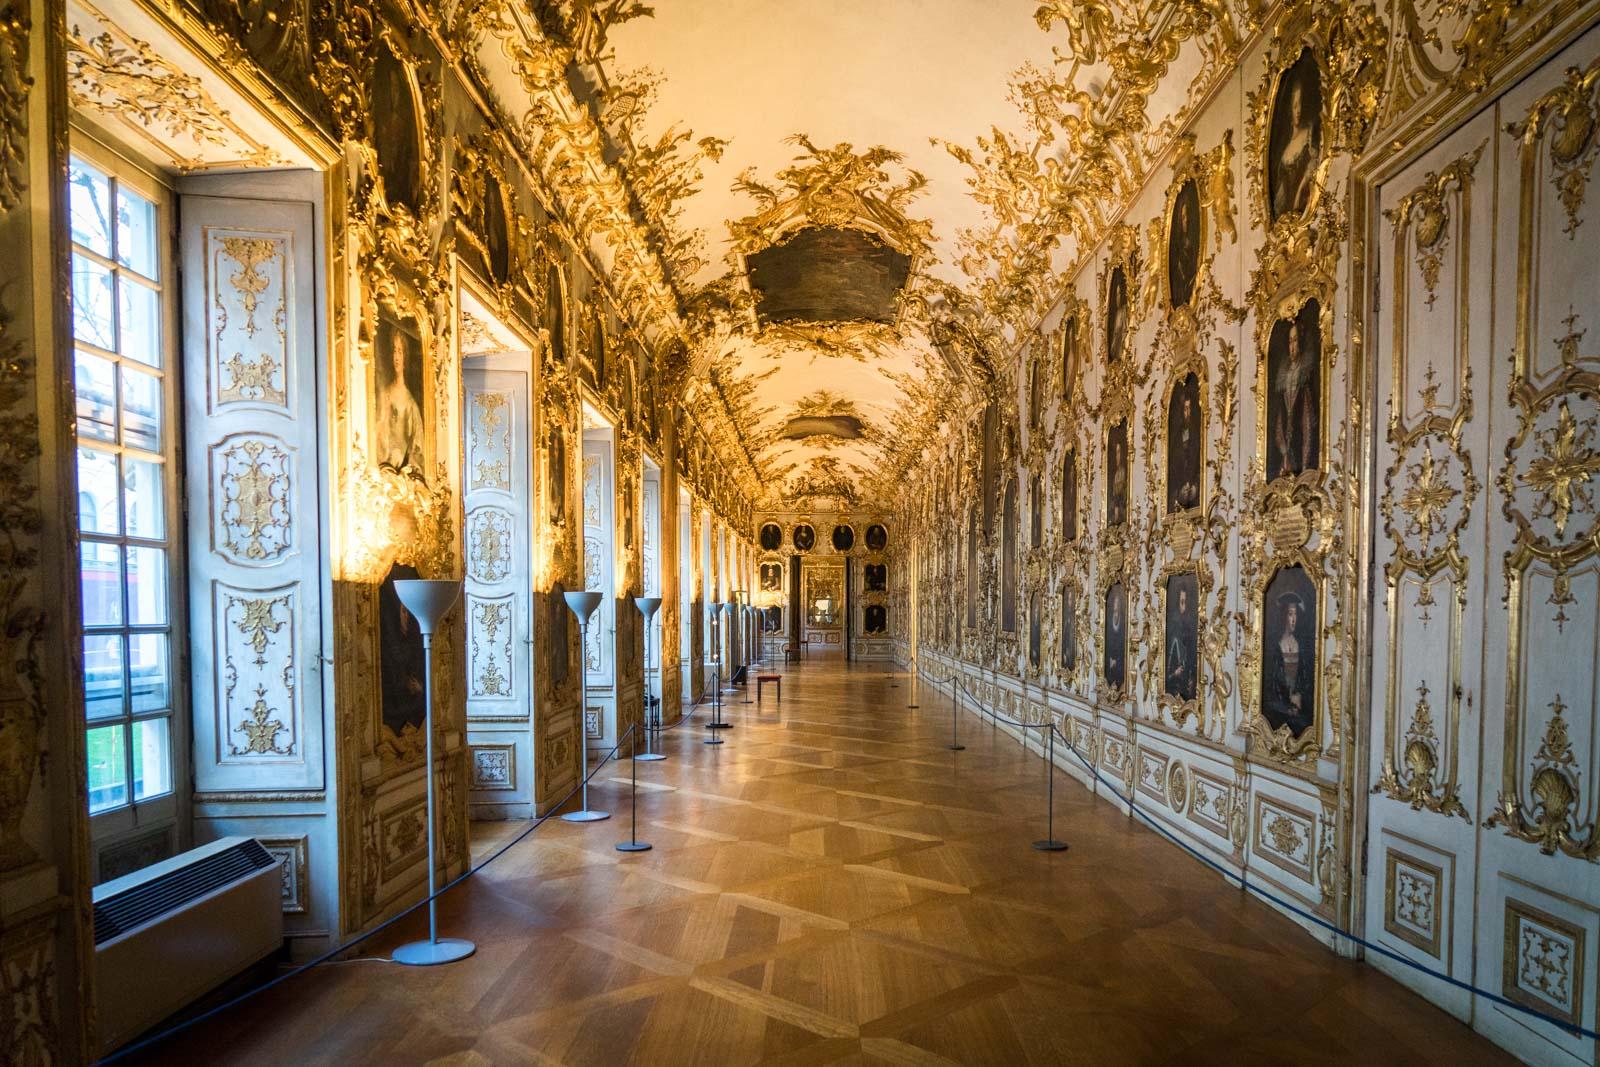 Munich Residenz, Germany